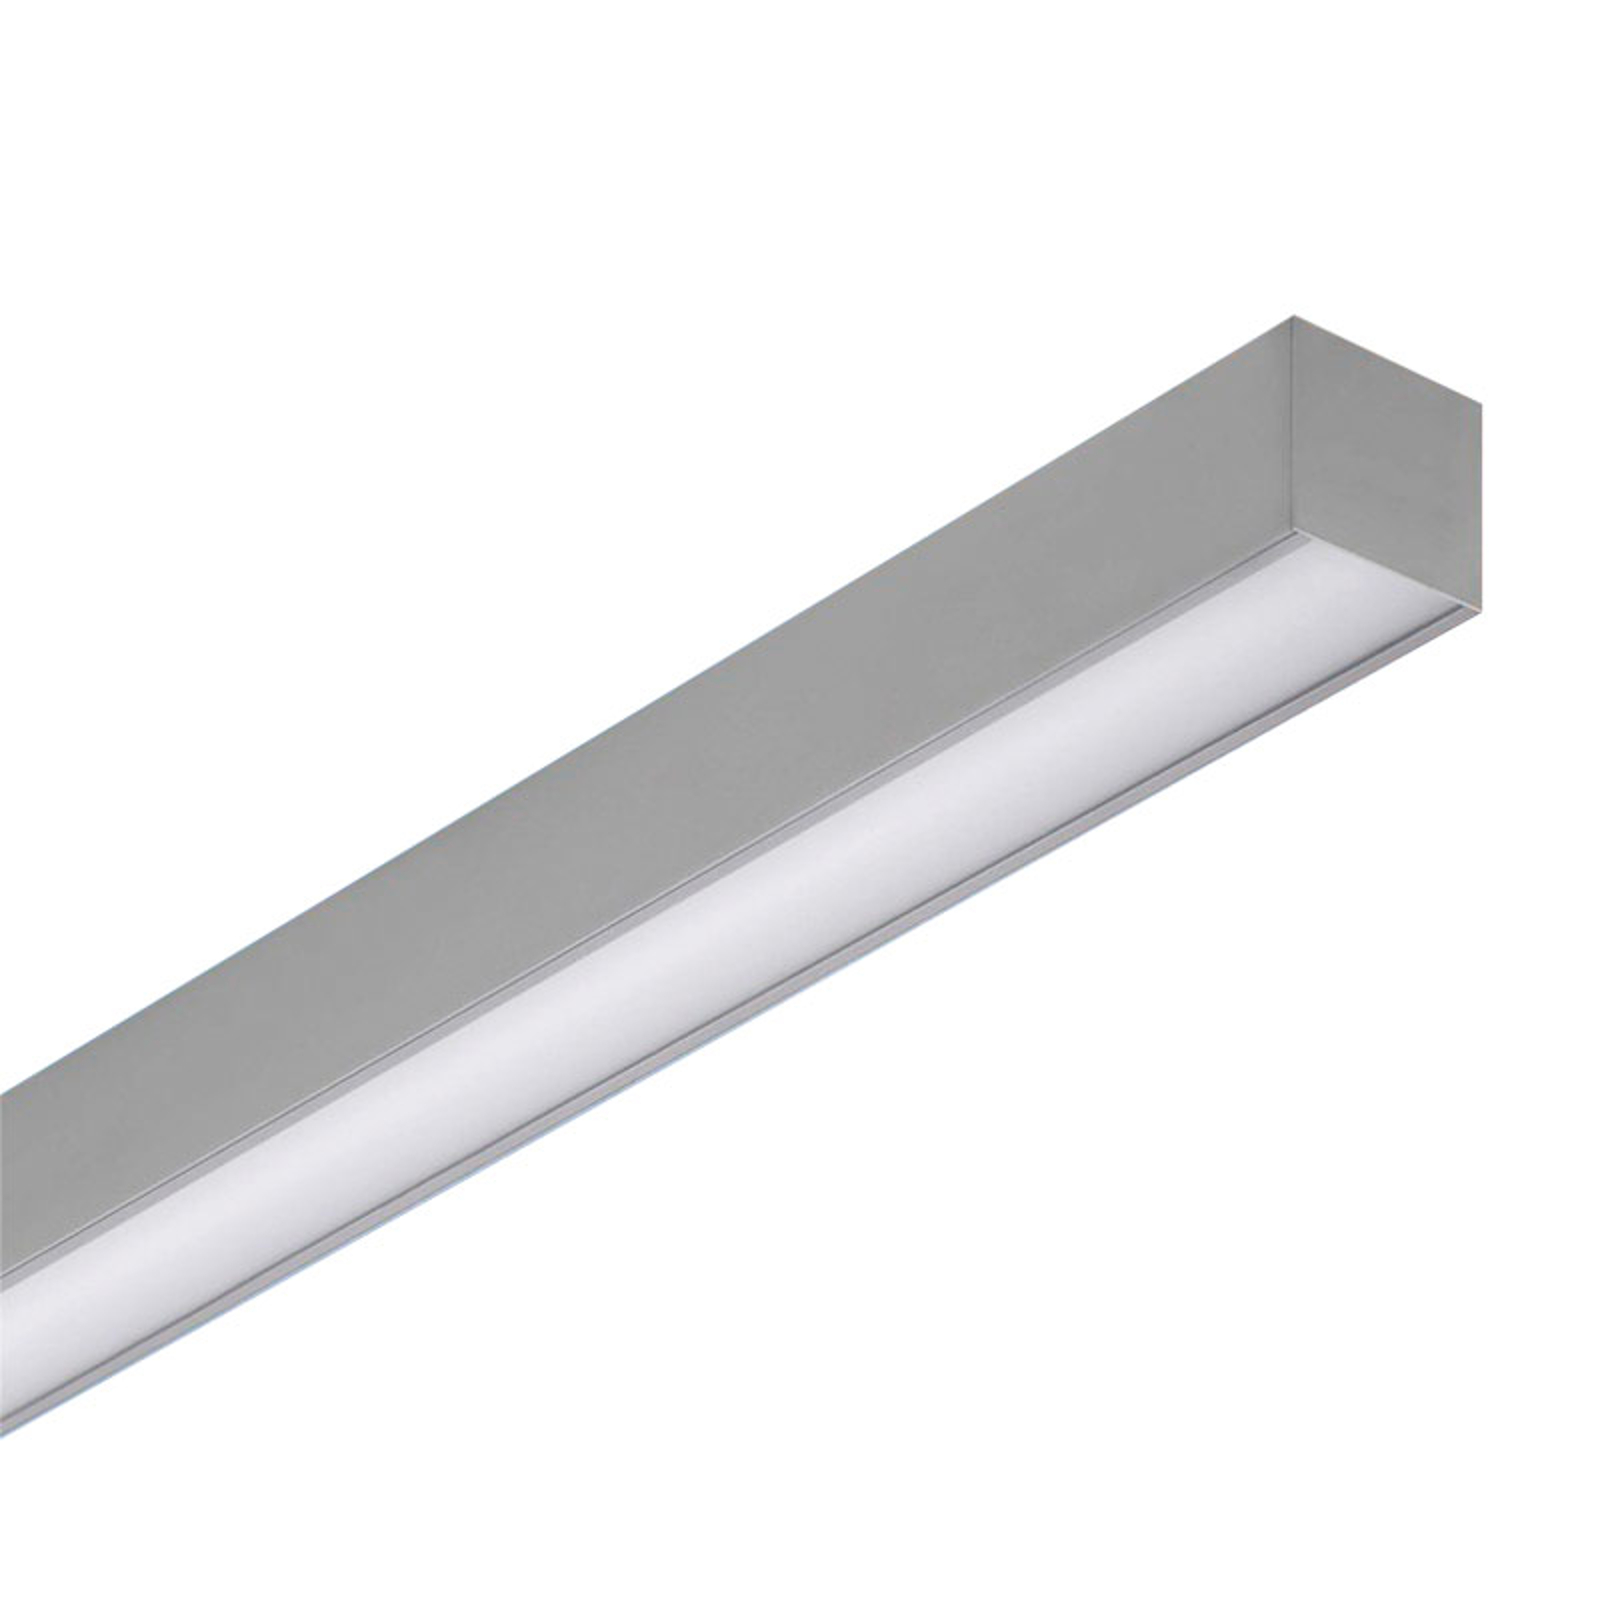 LKPW075 – mocny kinkiet LED, 4000K